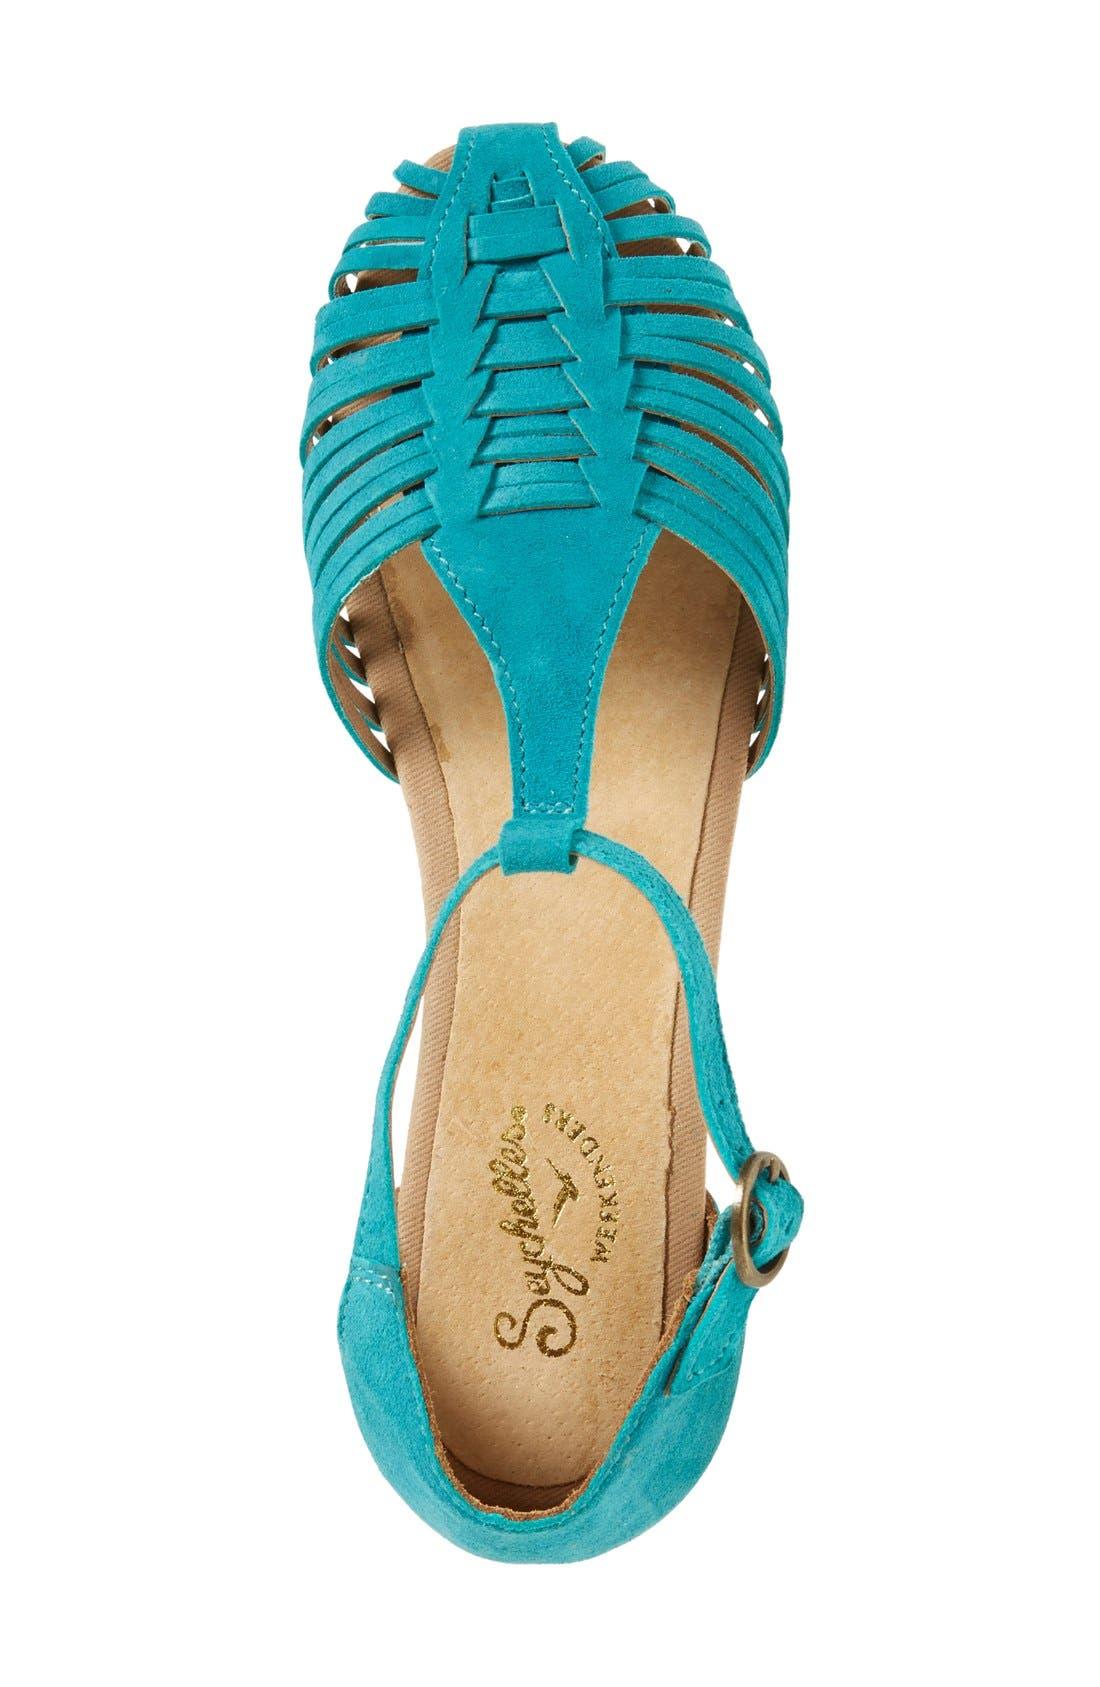 Alternate Image 3  - Seychelles 'Into Thin Air' Leather Huarache Flat Sandal (Women)